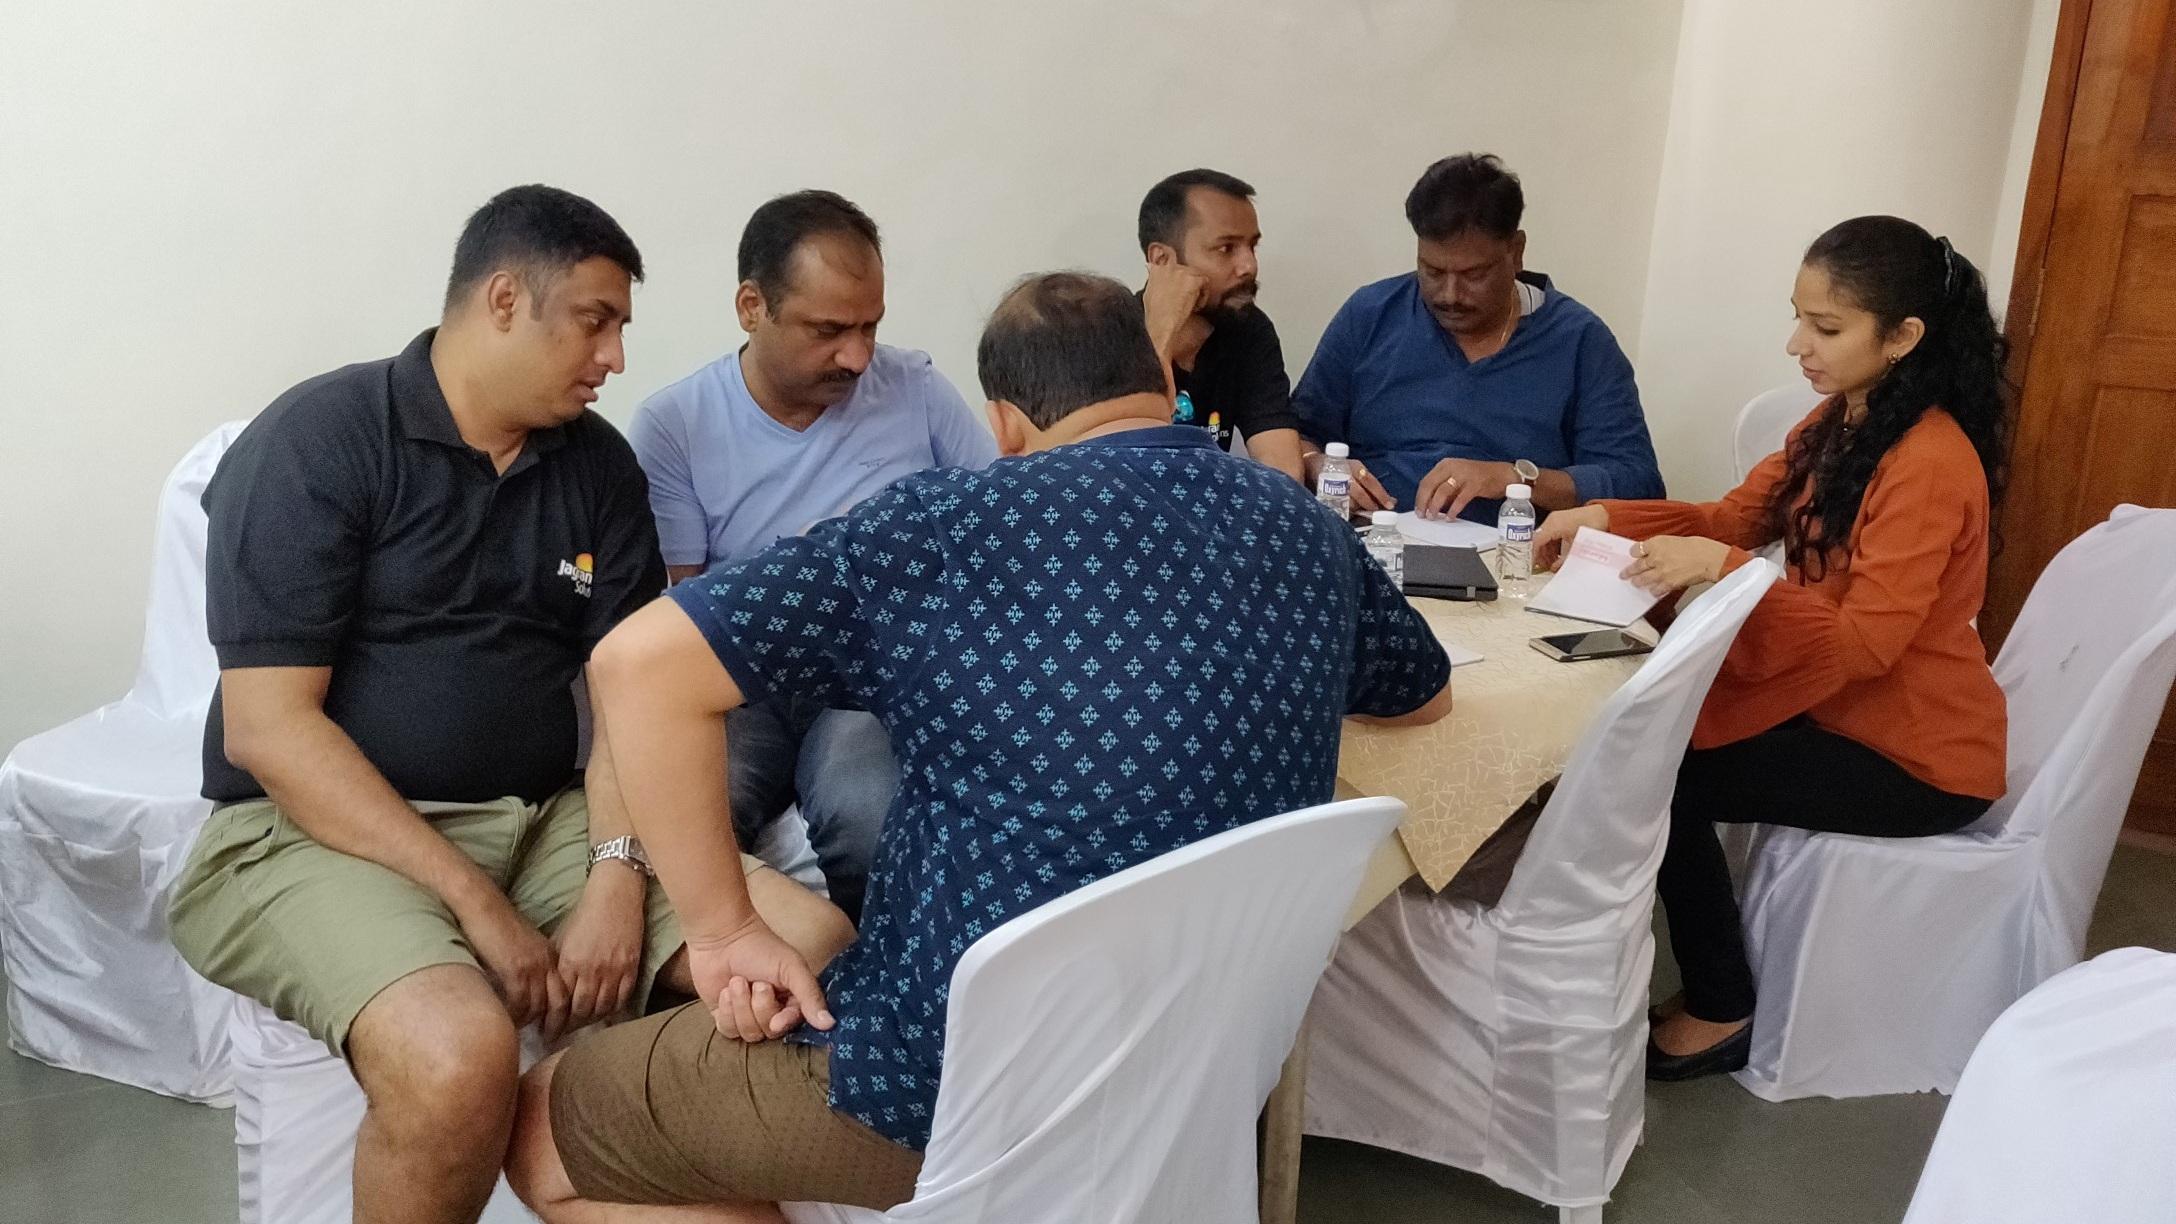 Jagran_20181008_110627.jpg